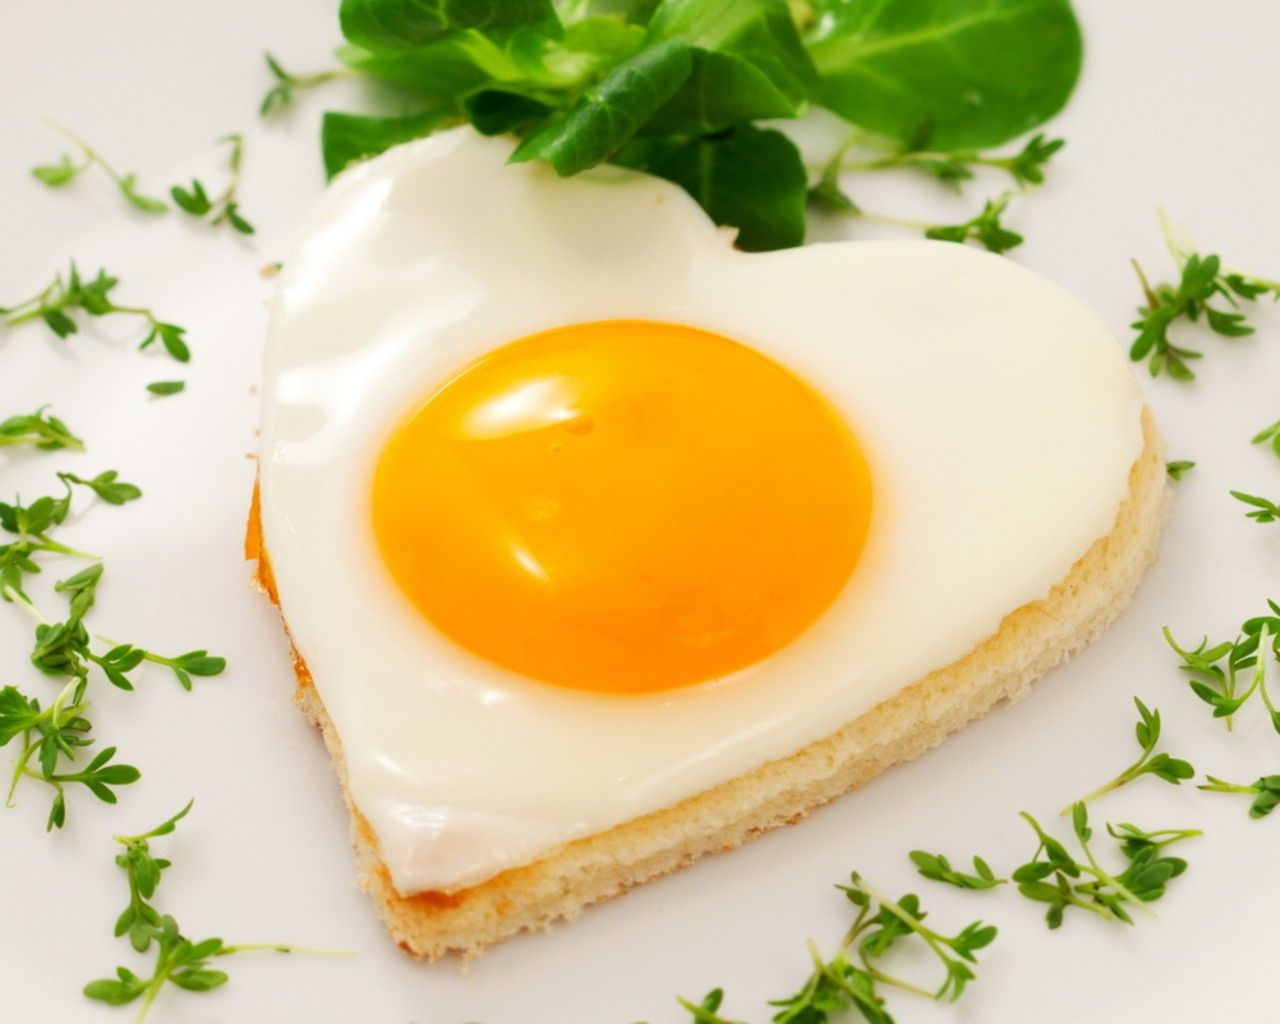 Egs Healthy Food Wallpaper Hd 11451 Wallpaper